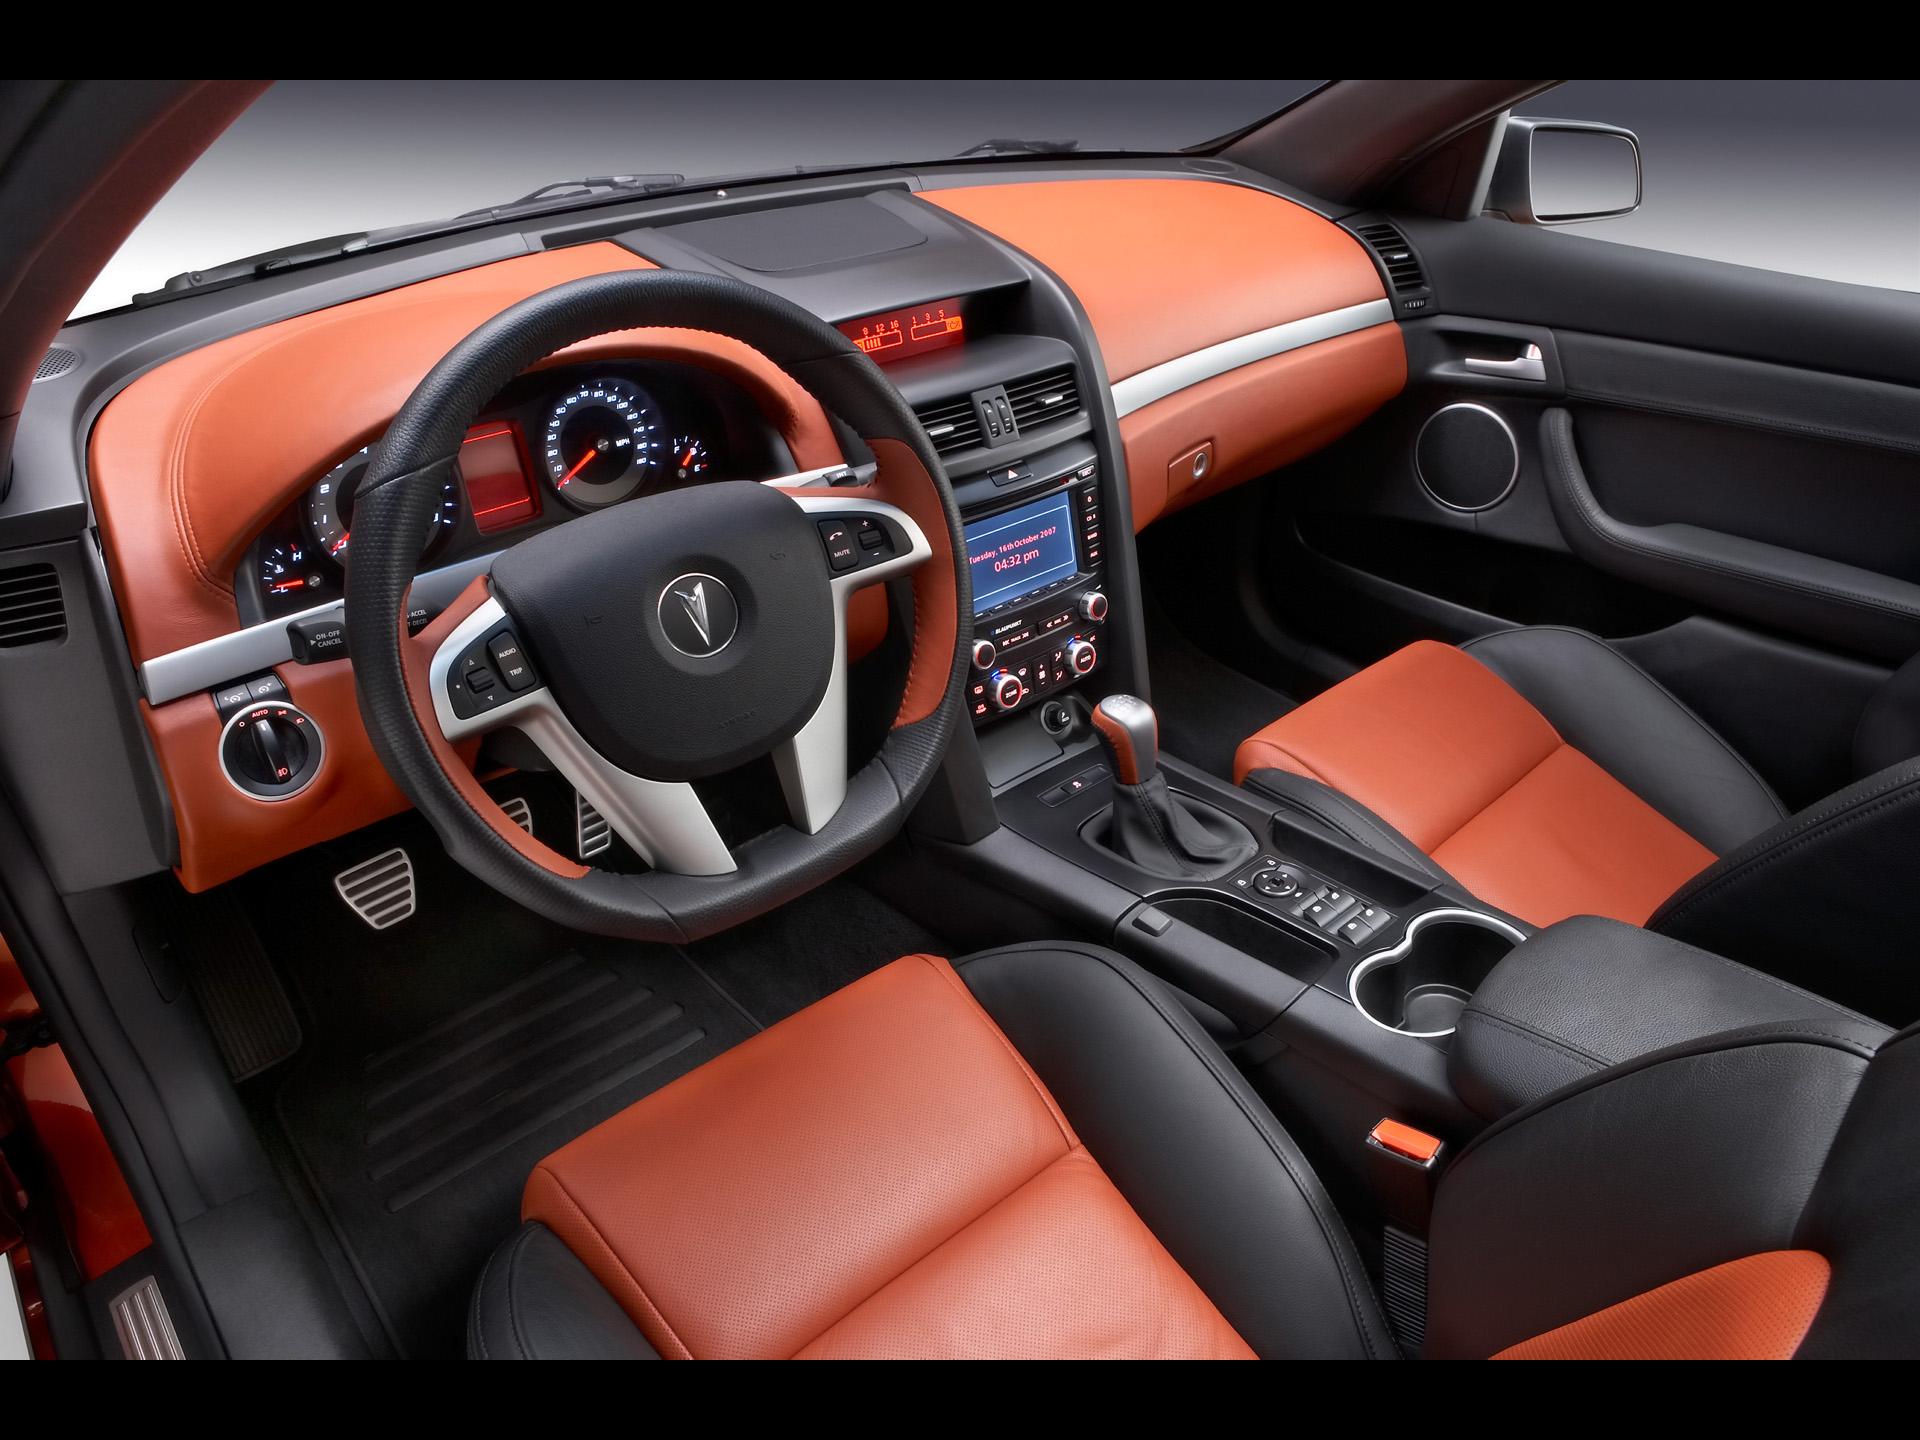 Pontiac G8 Gt Picture 48960 Pontiac Photo Gallery Carsbase Com